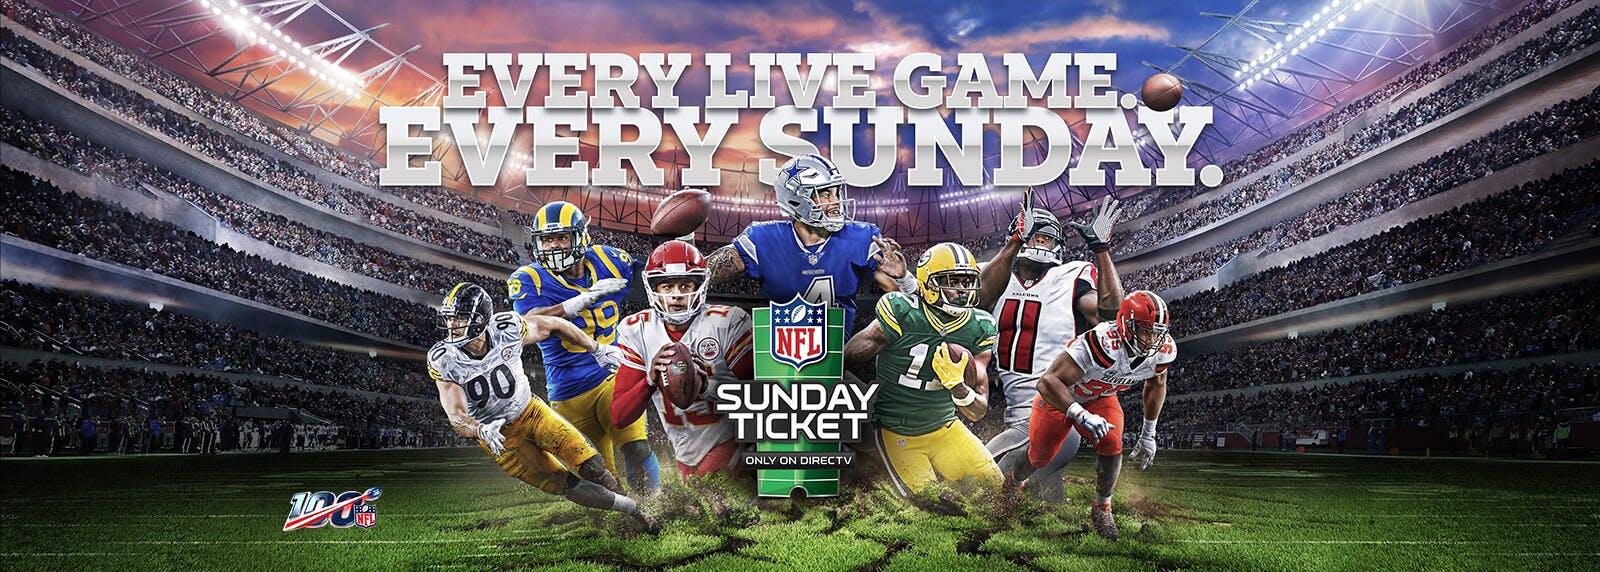 watch saints vs jaguars live stream nfl sunday ticket